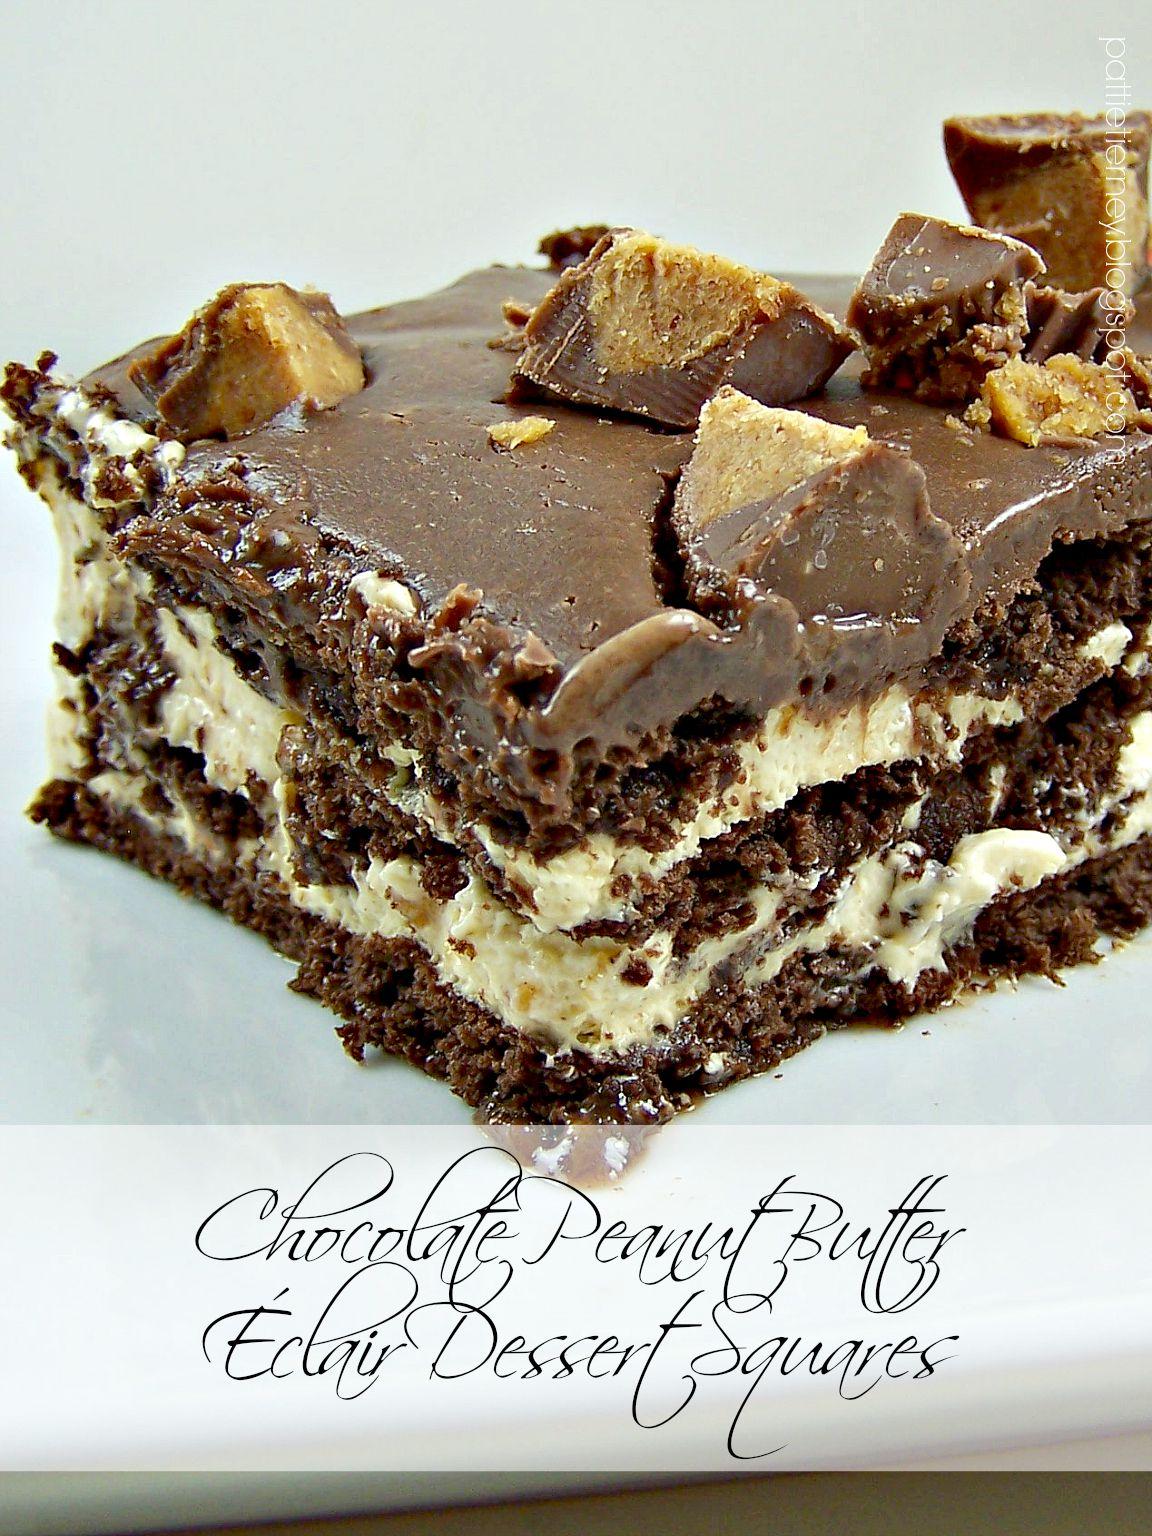 Olla-Podrida: Chocolate Peanut Butter Éclair Dessert Squares